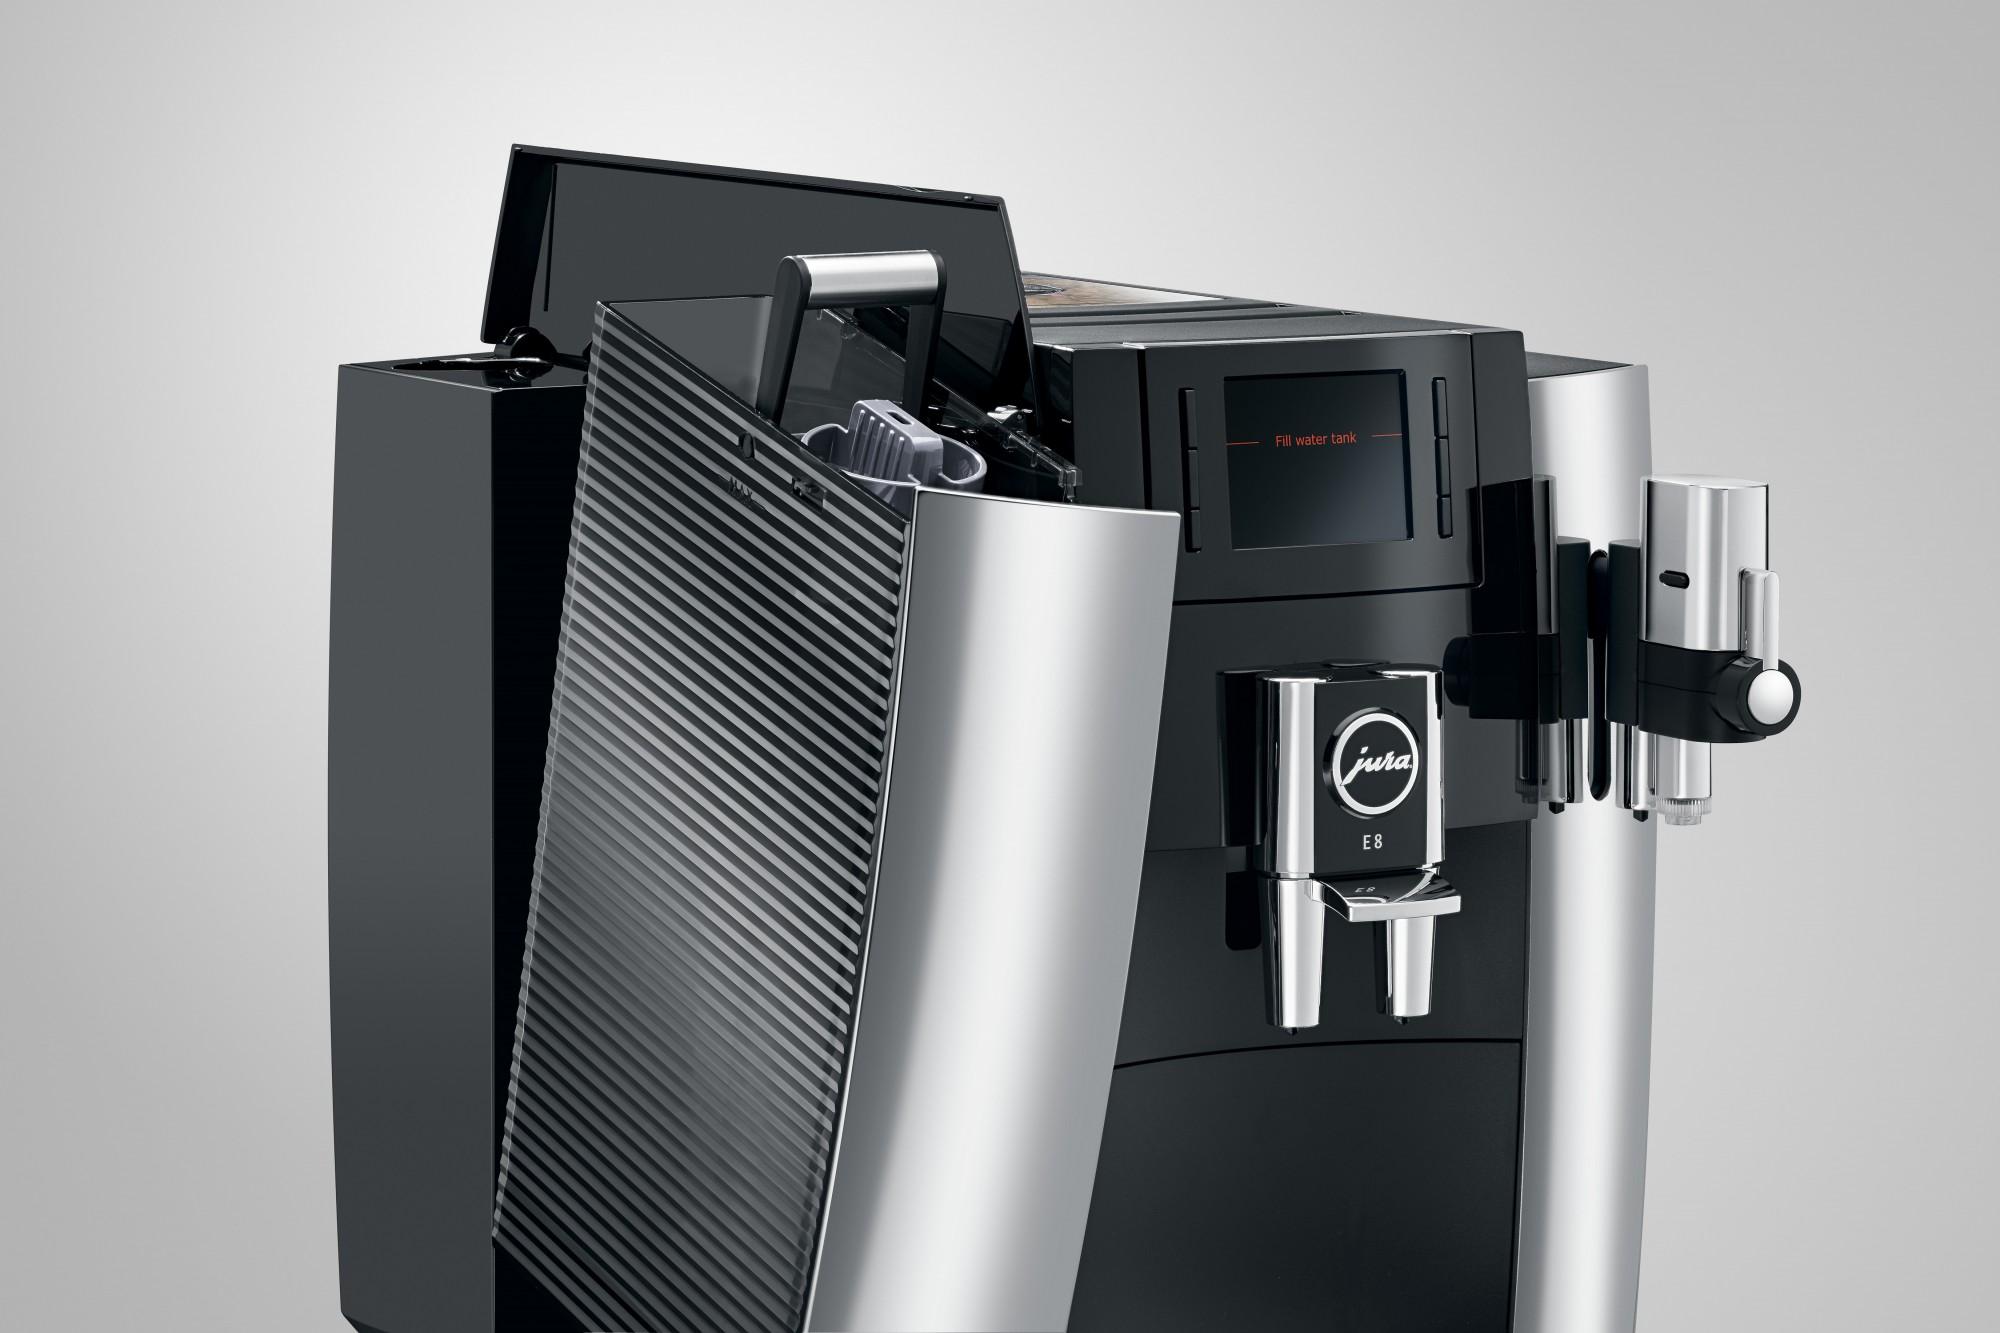 Jura E8 koffiemachine kleur chroom